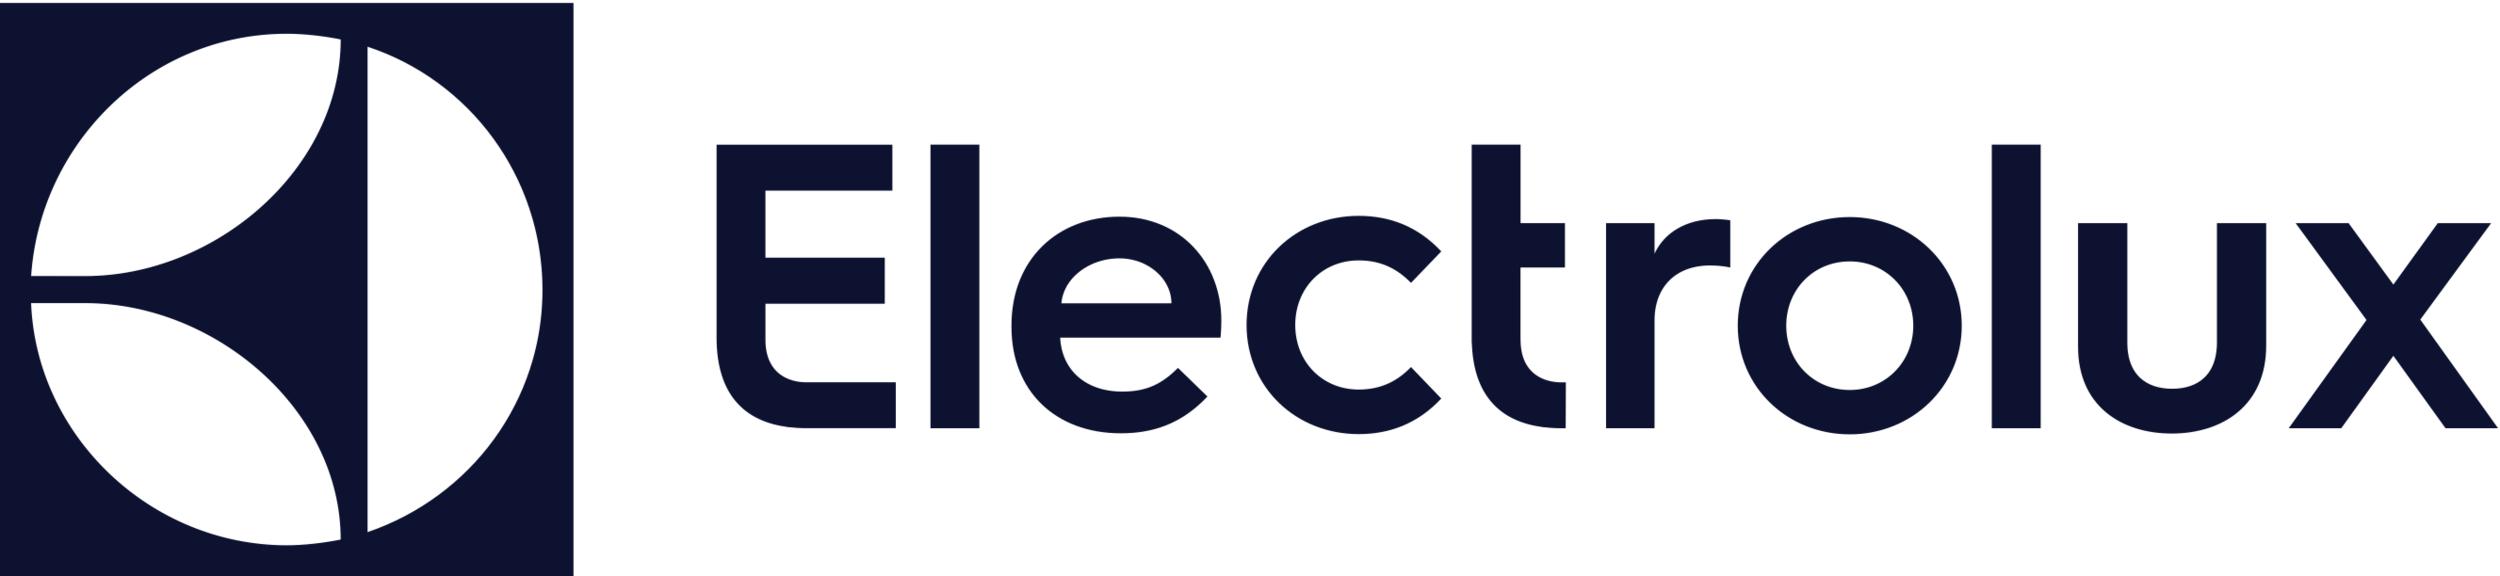 Electrolux_logo_master_blue_CMYK.png